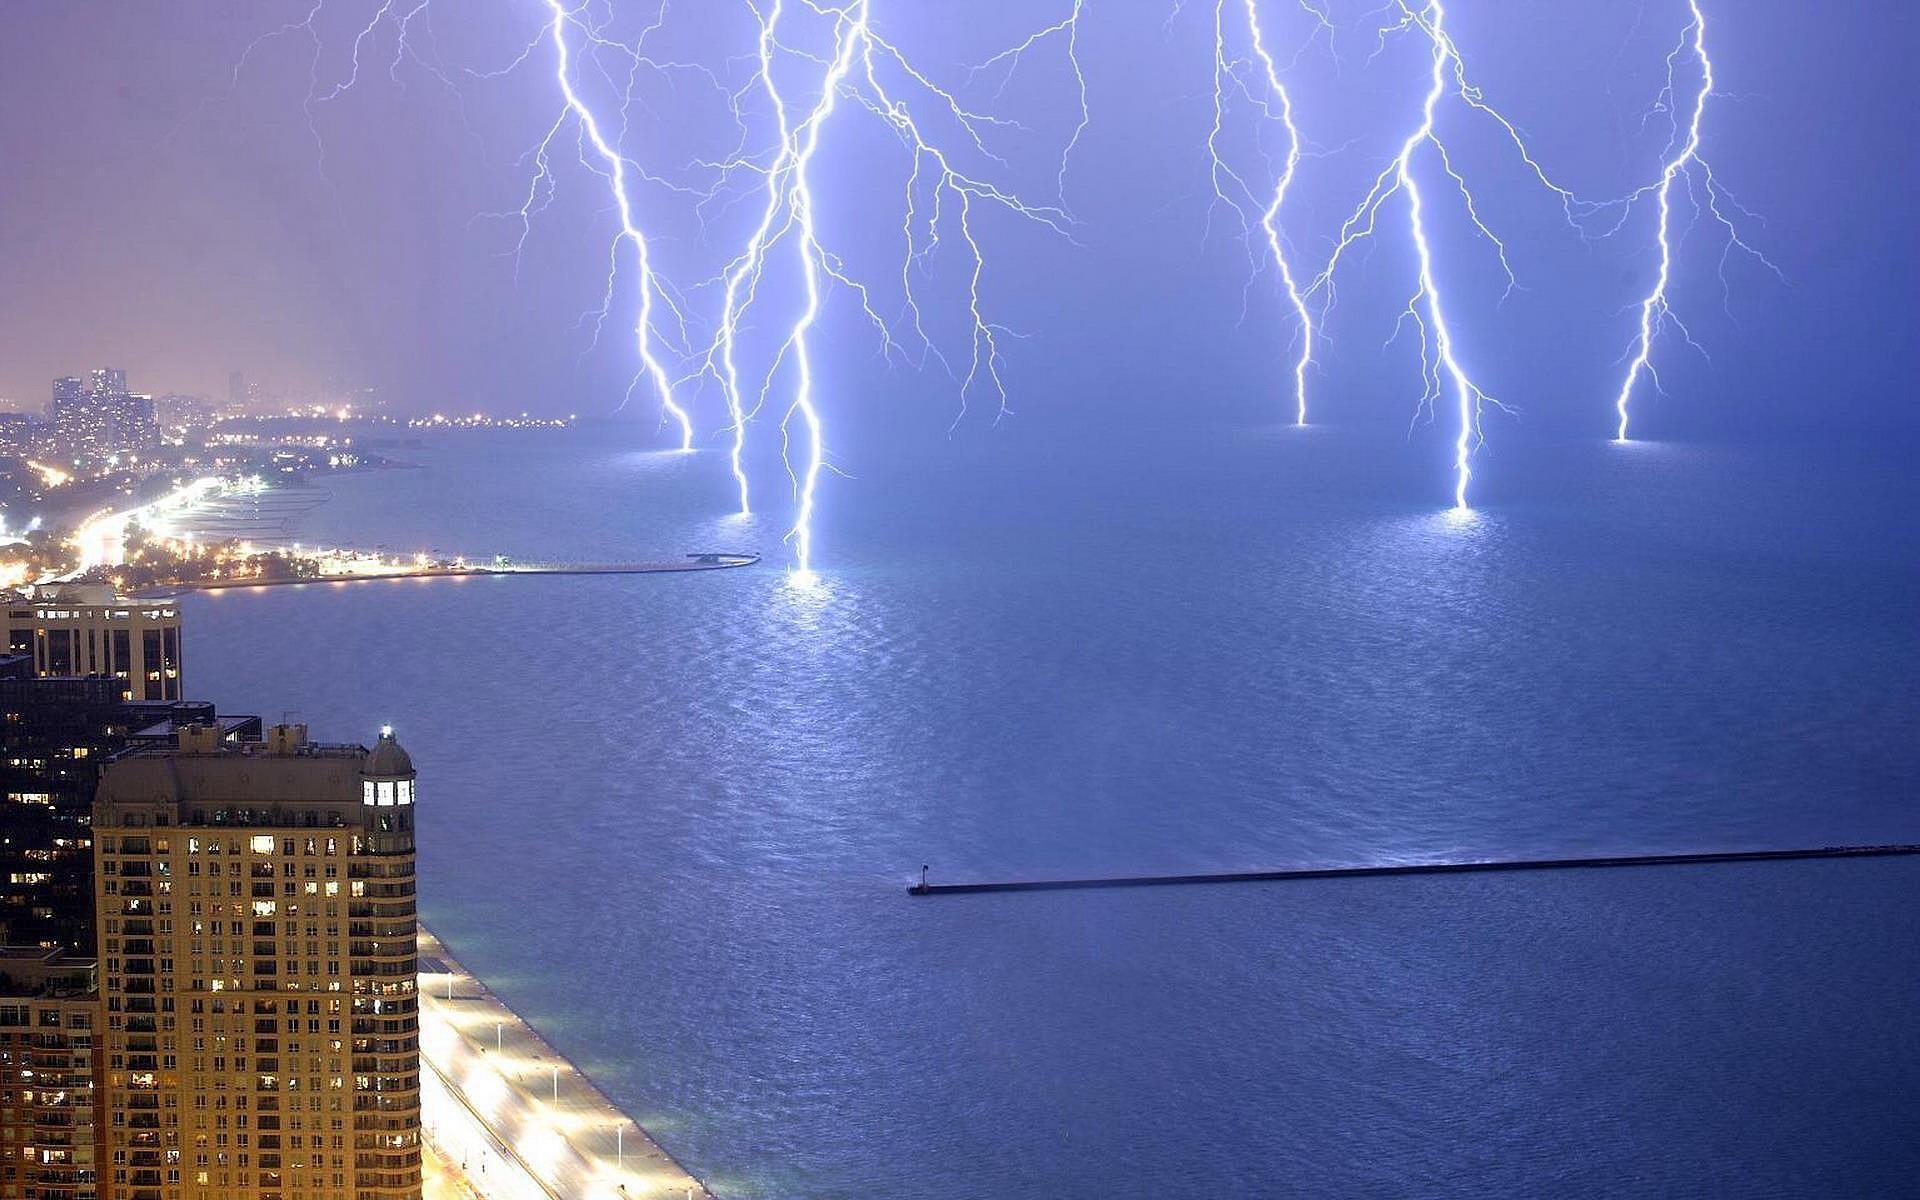 Lightning Strike on Water   HD Wallpaper